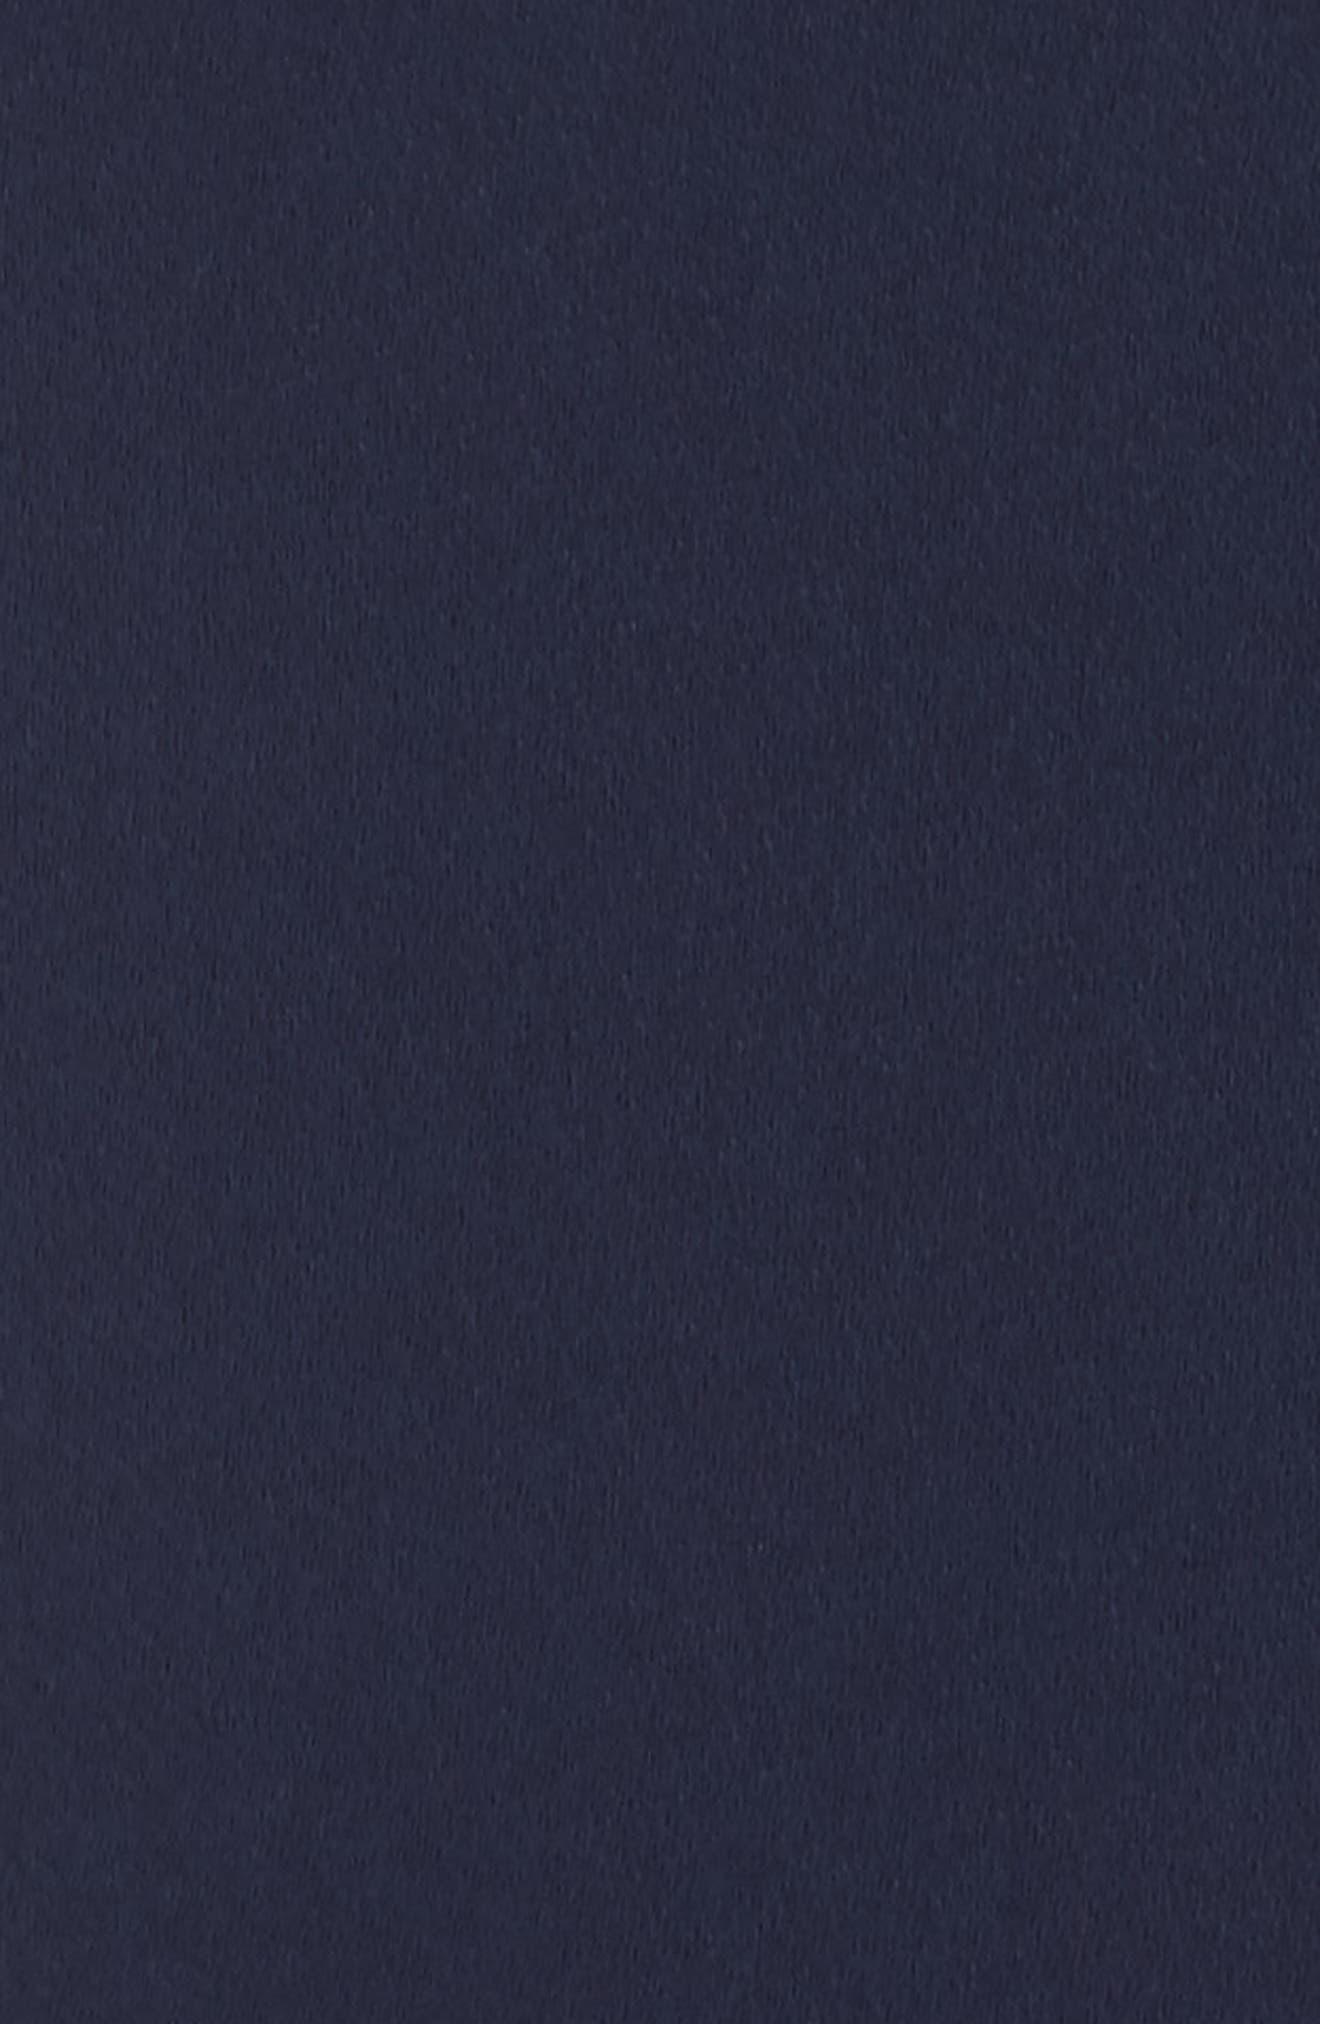 Lace Back Halter Romper,                             Alternate thumbnail 6, color,                             Navy